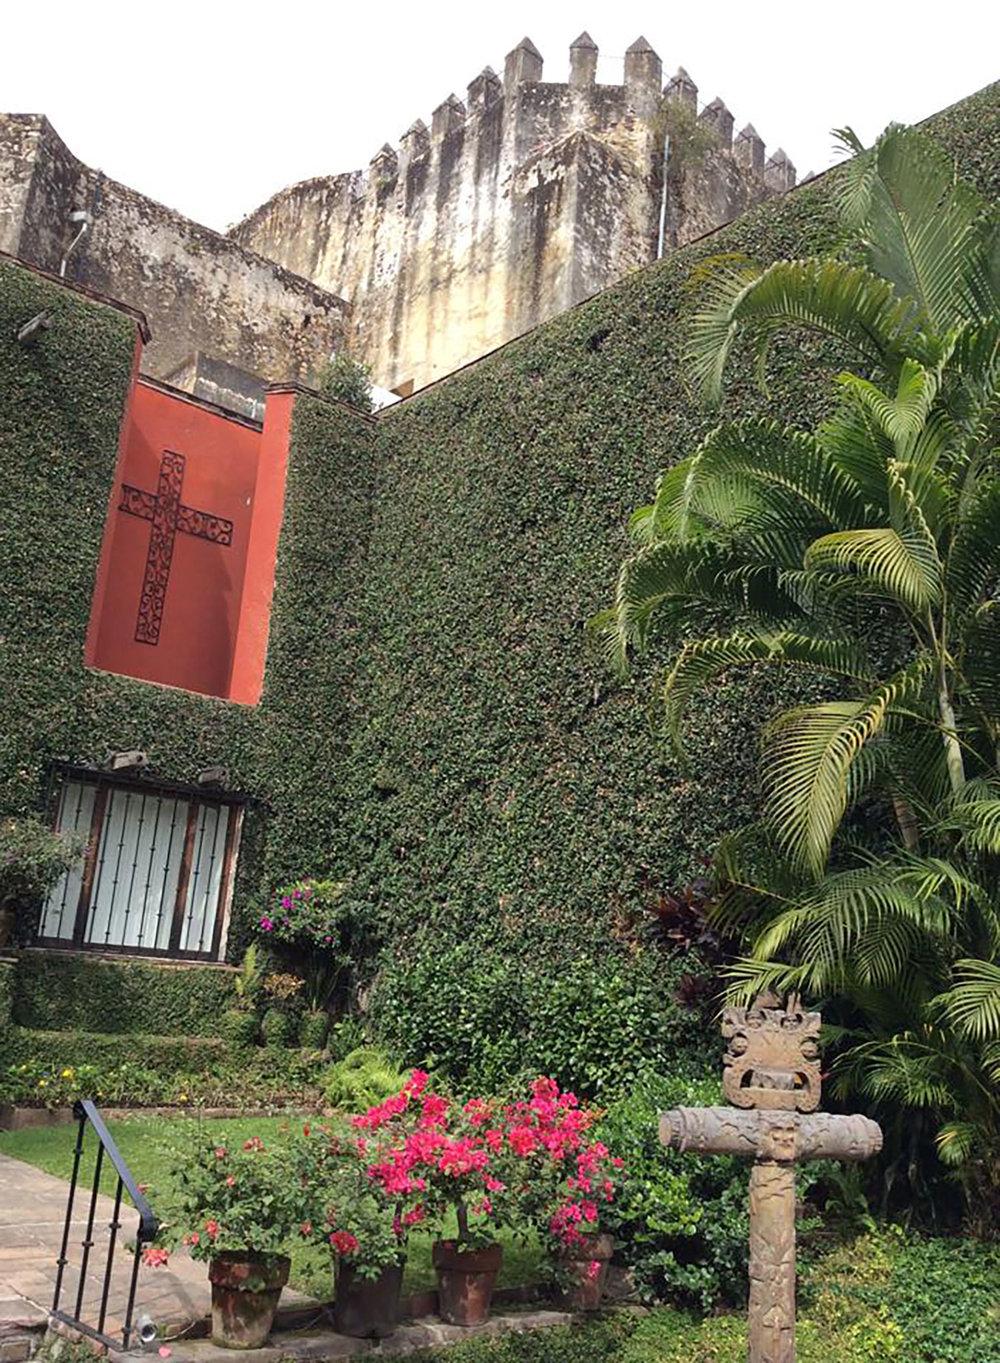 Hammocks_and_Ruins_Mayan_Mythology_What_to_Do_Mexico_Maya_Diego_Rivera_Museum_Robert_Brady_Cuernavaca_2.jpg